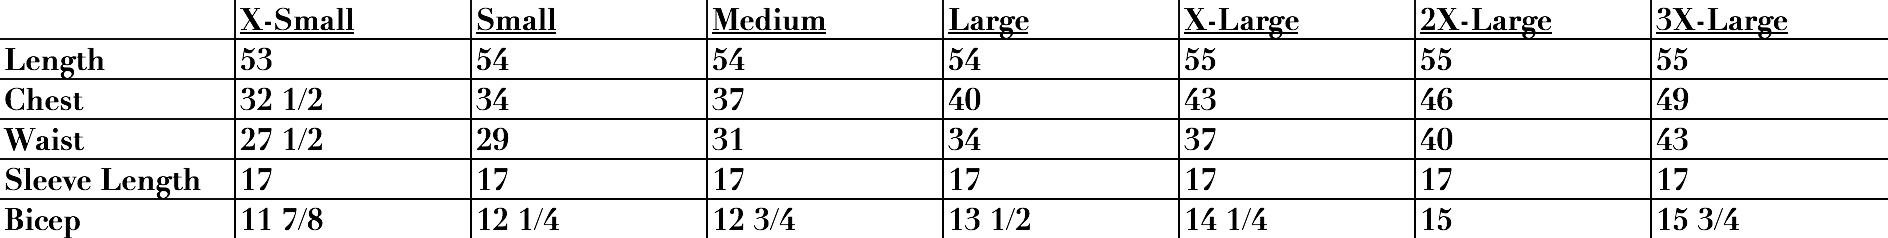 darling-dress-size-chart.png